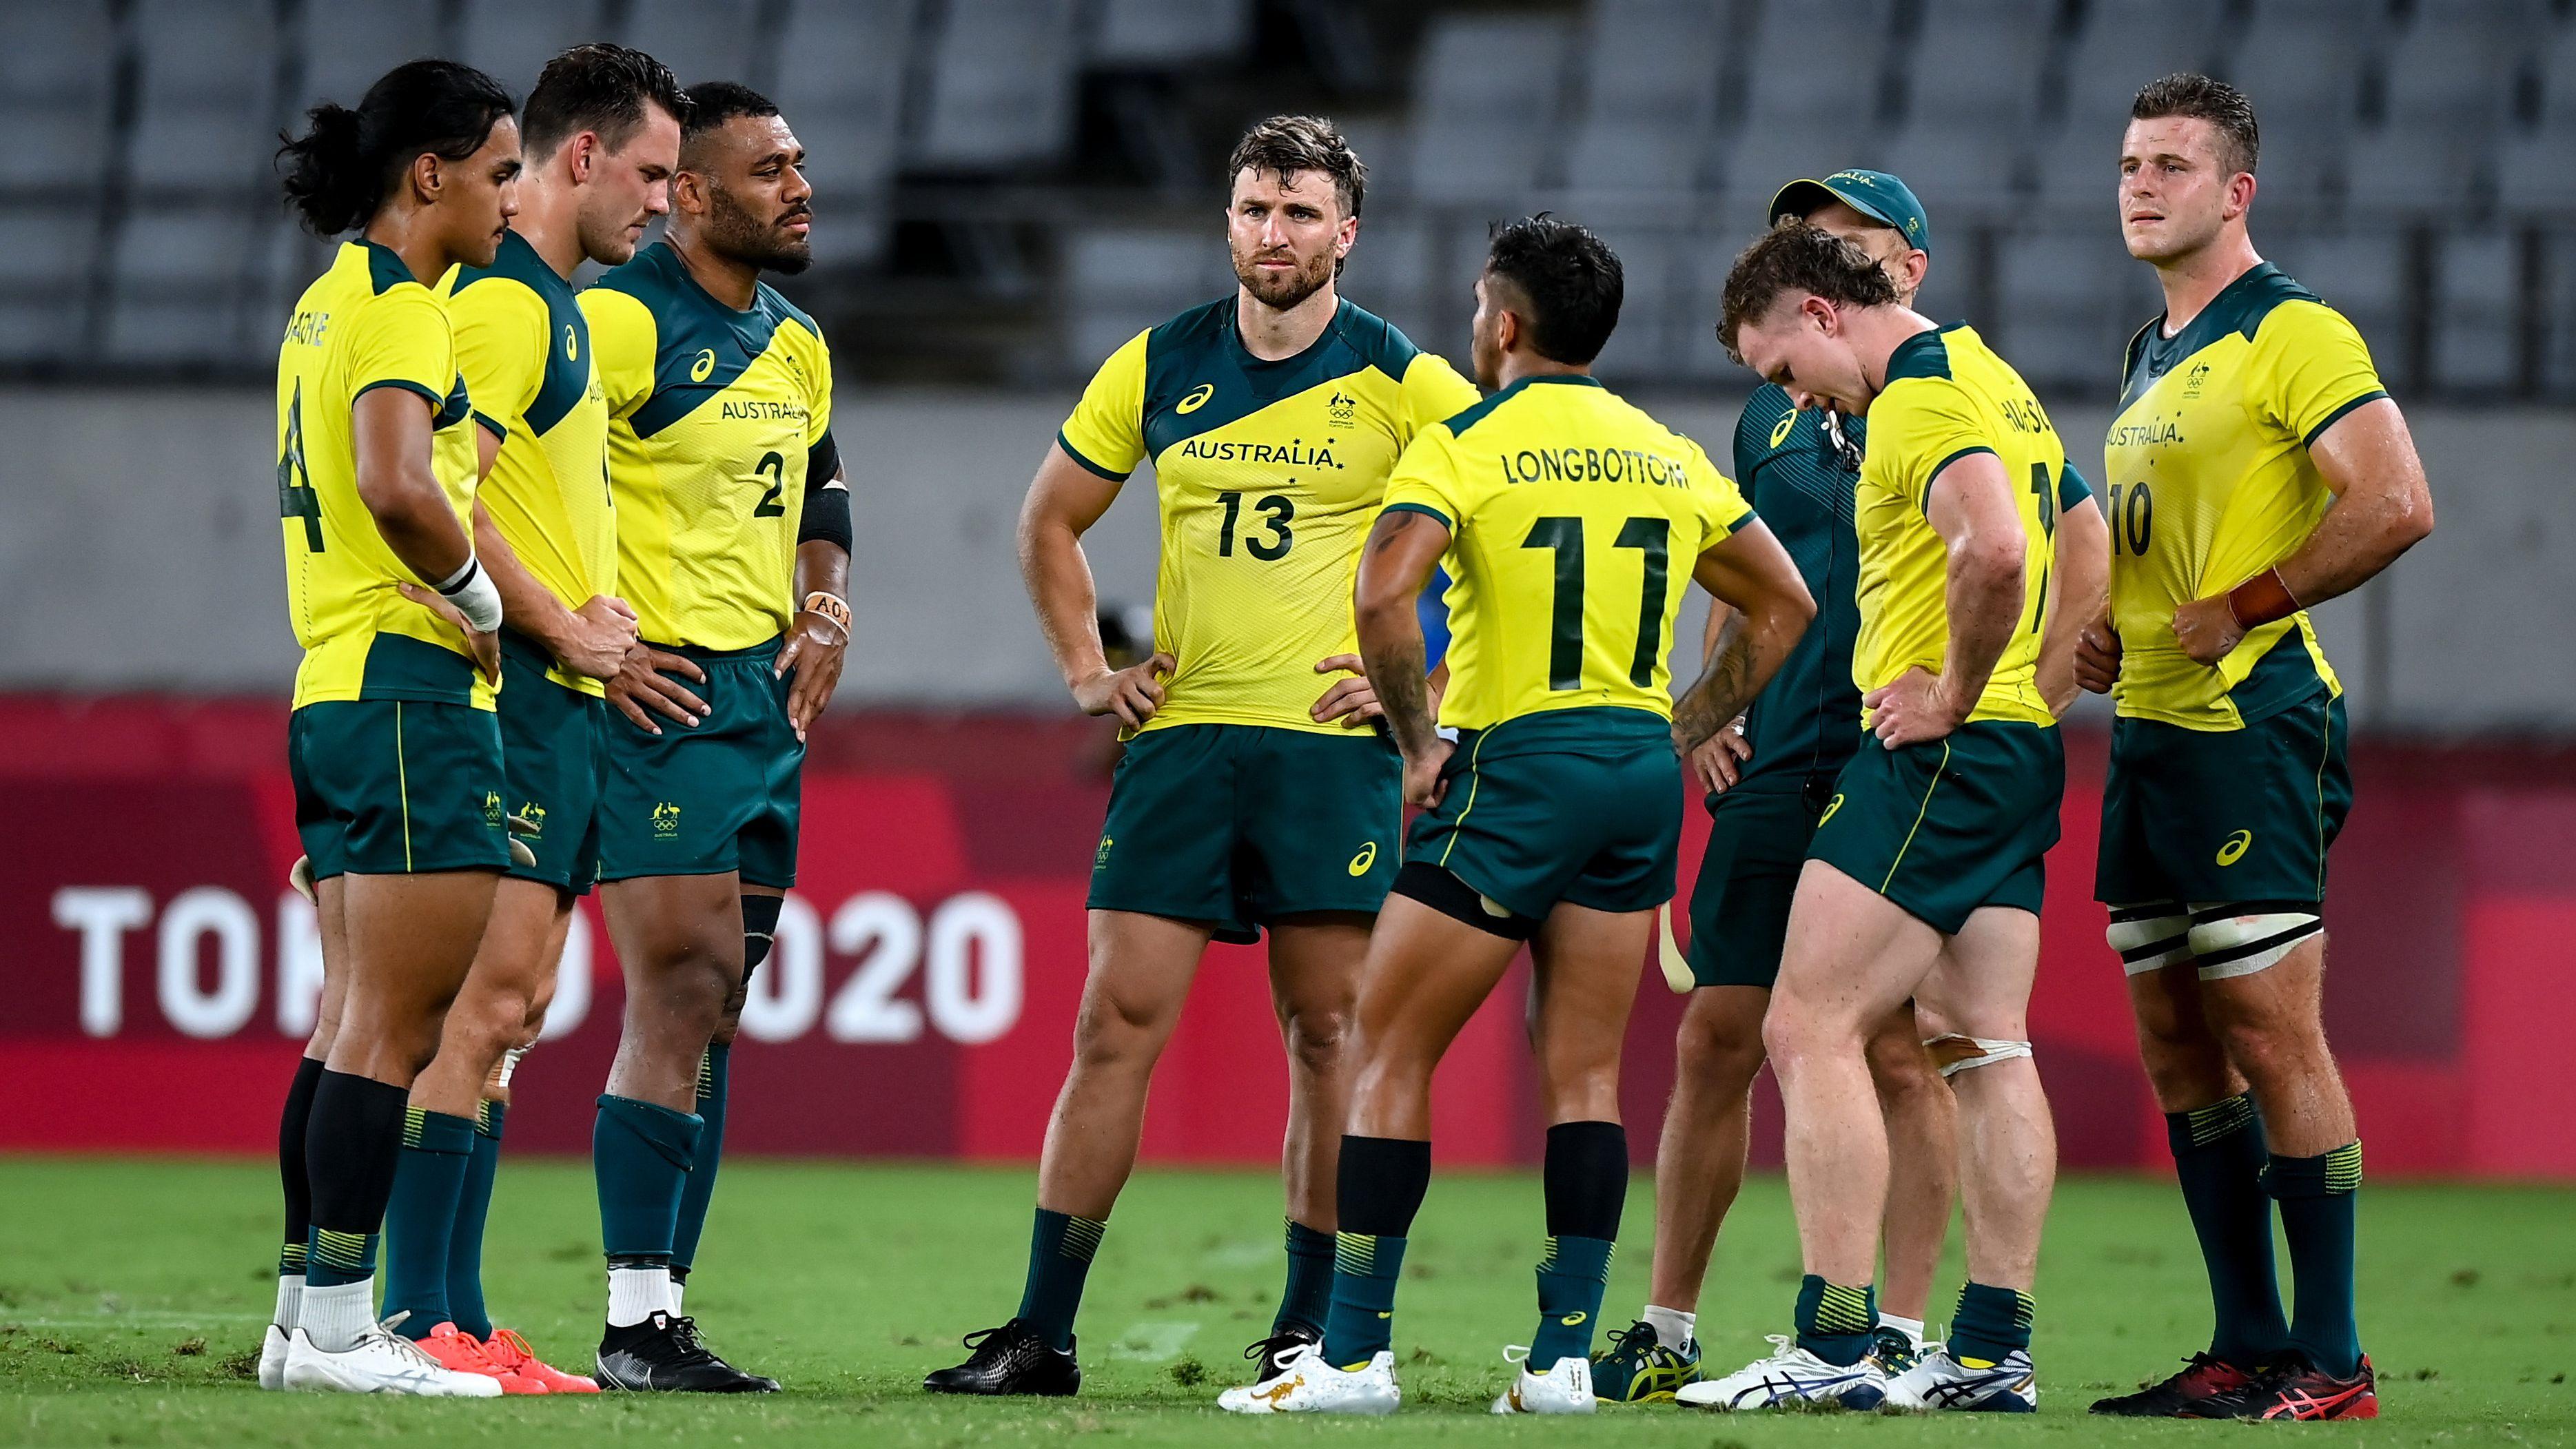 Rugby Australia slams Olympic team over flight